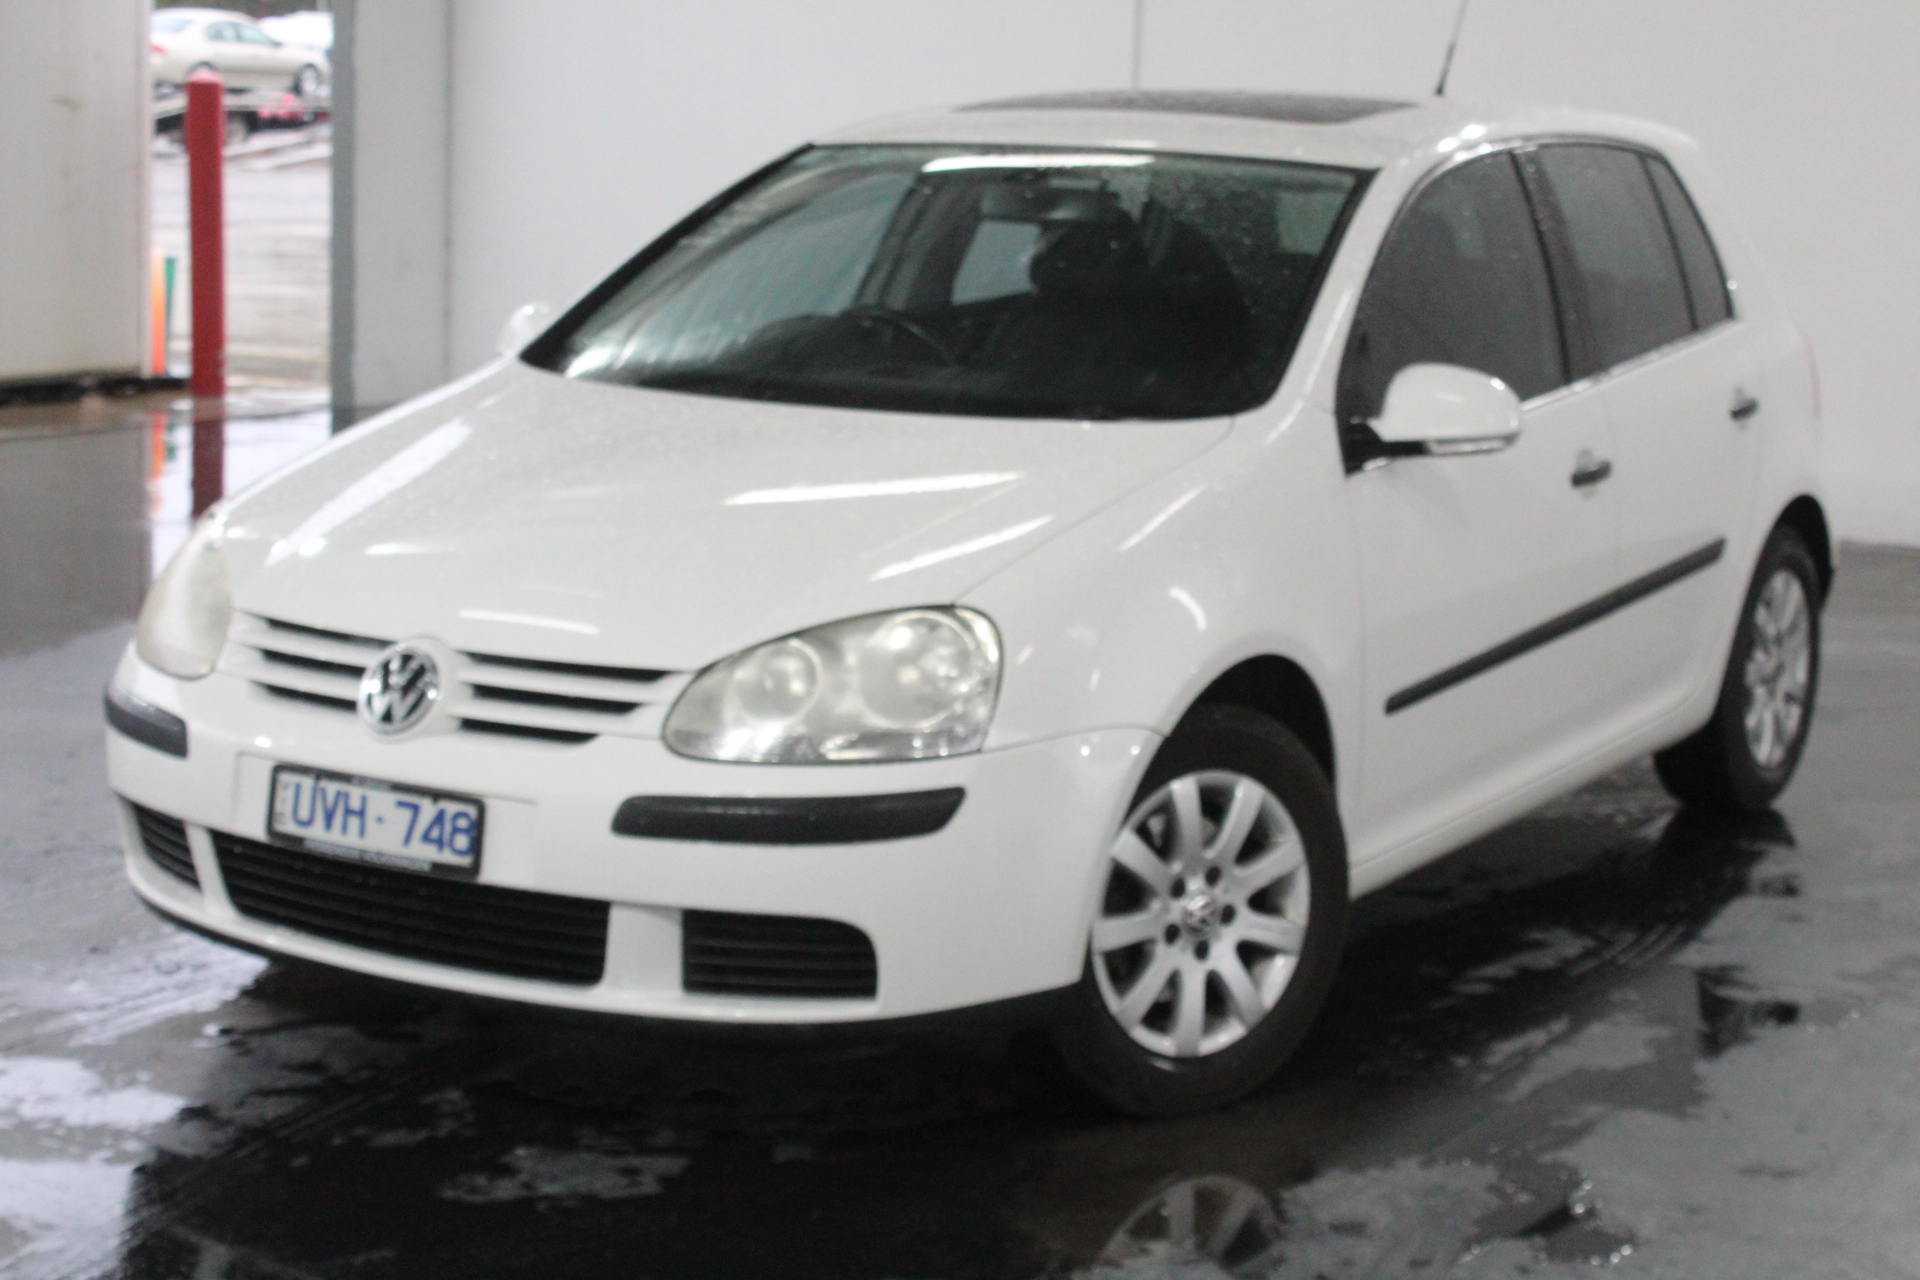 2007 Volkswagen Golf 1.9 TDI Comfortline 1k Turbo Diesel Auto Hatchback